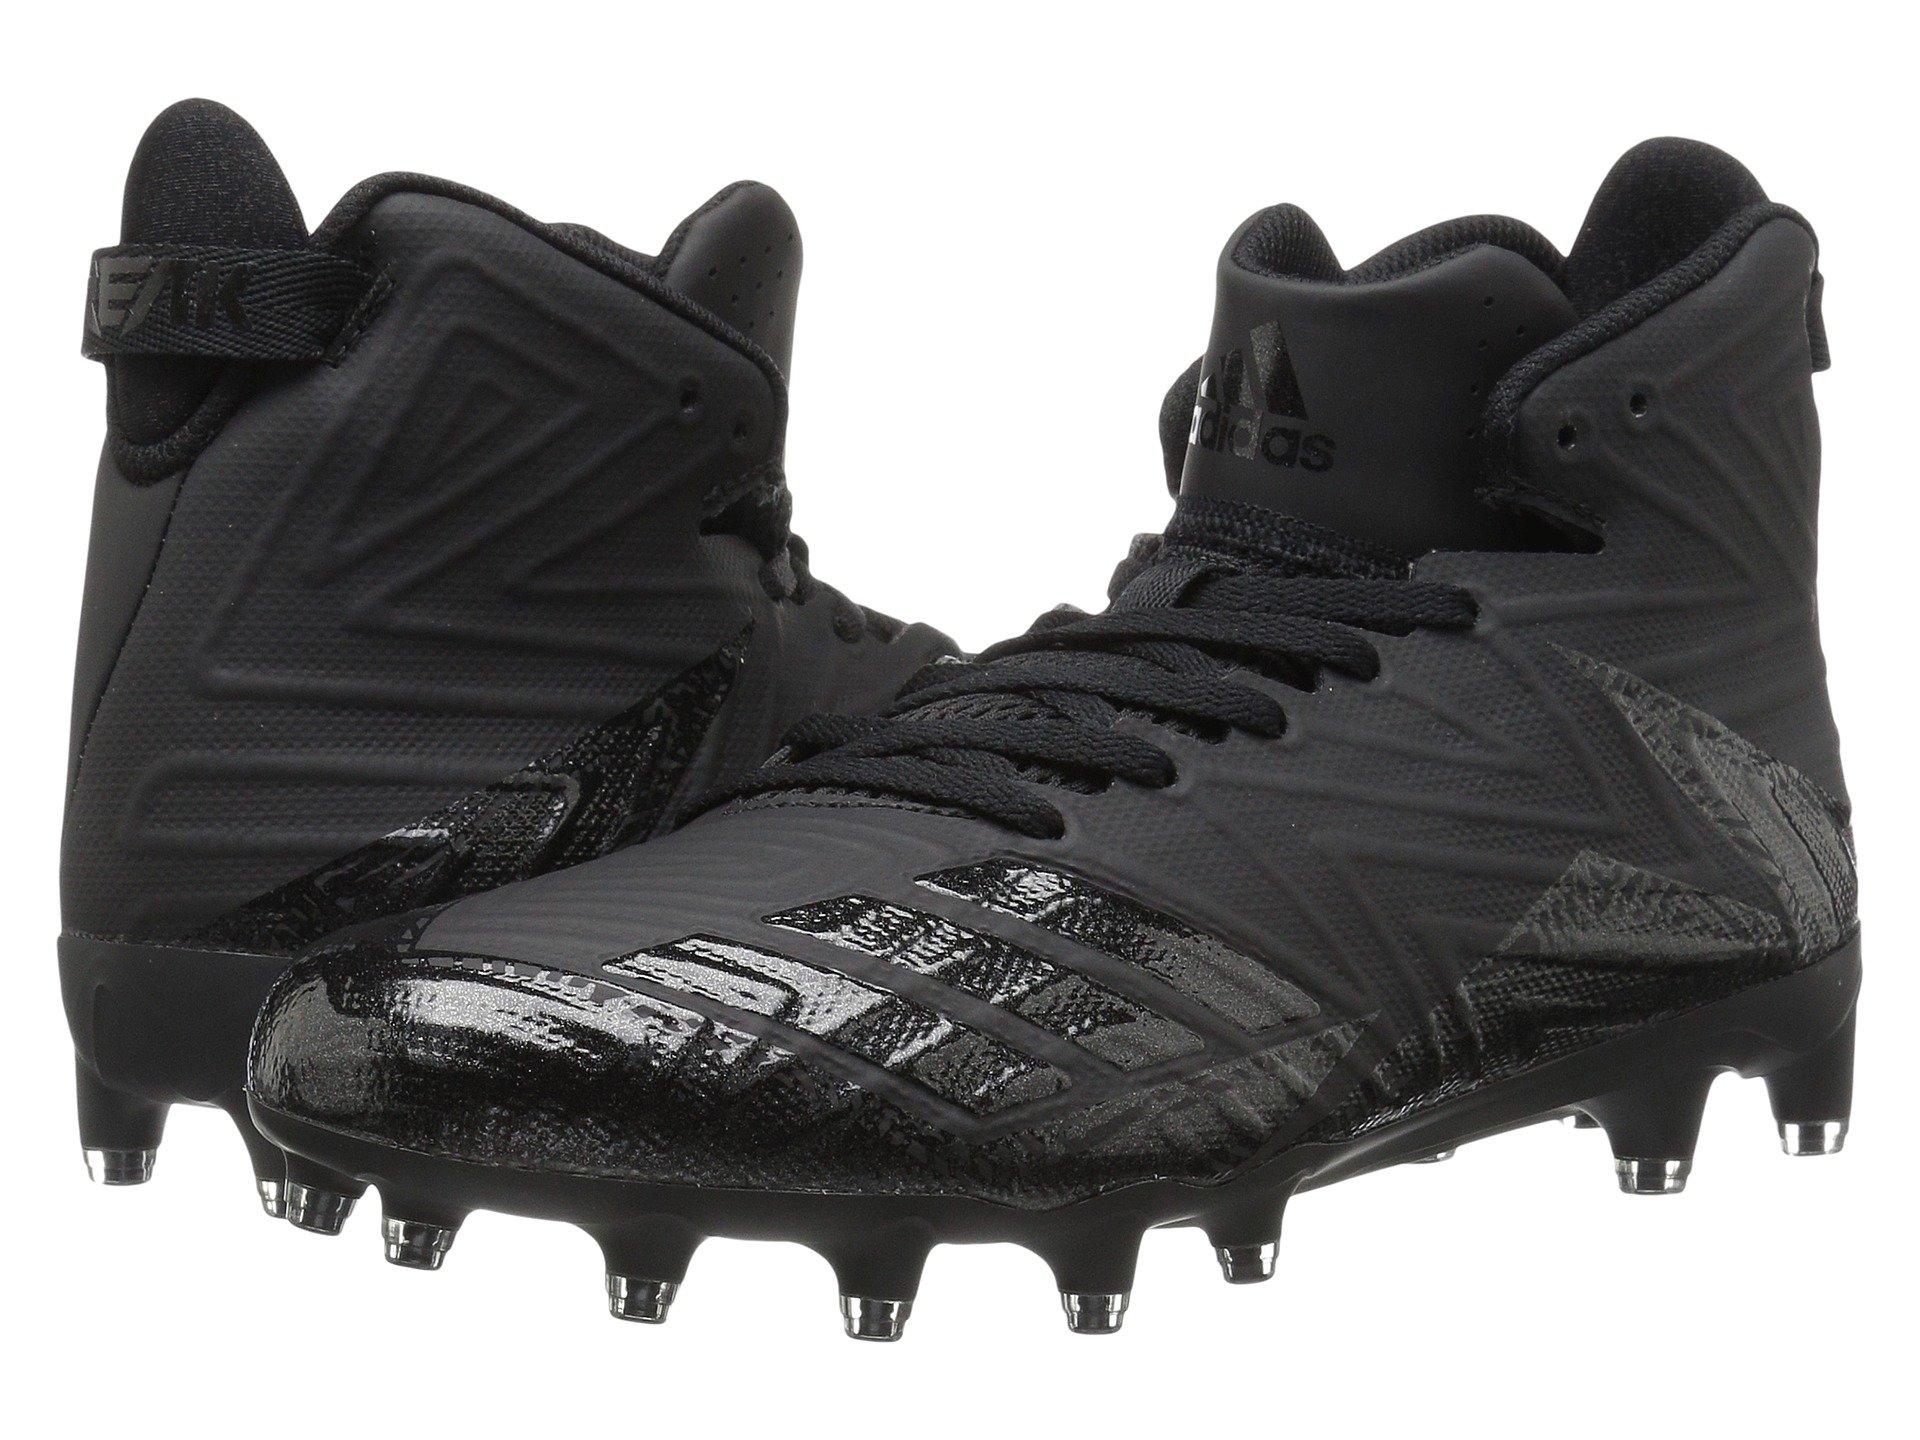 promo code 95b54 b9509 Adidas Originals Freak X Carbon Mid Football In Black